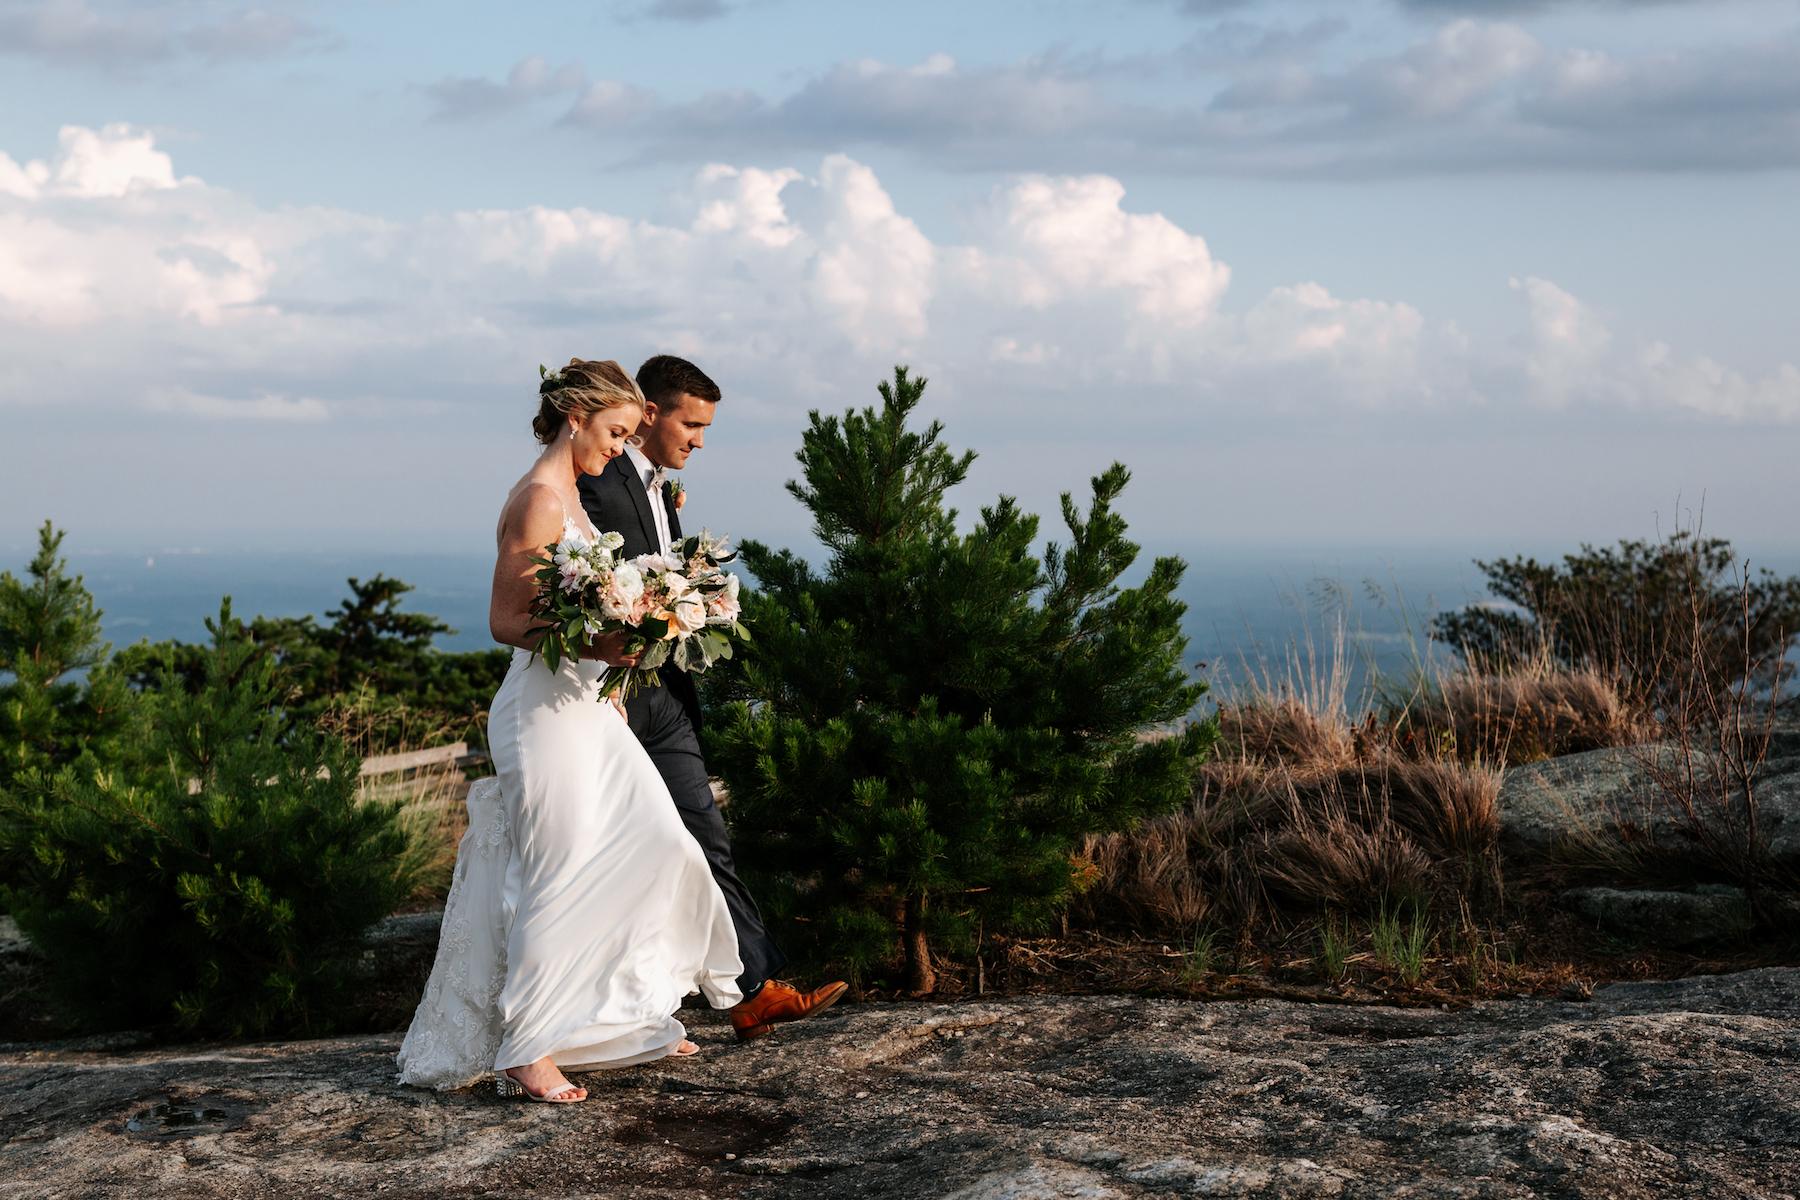 wedding-engagement-photographer-spartanburg-greenville-columbia-carolina-south-north-531.JPG